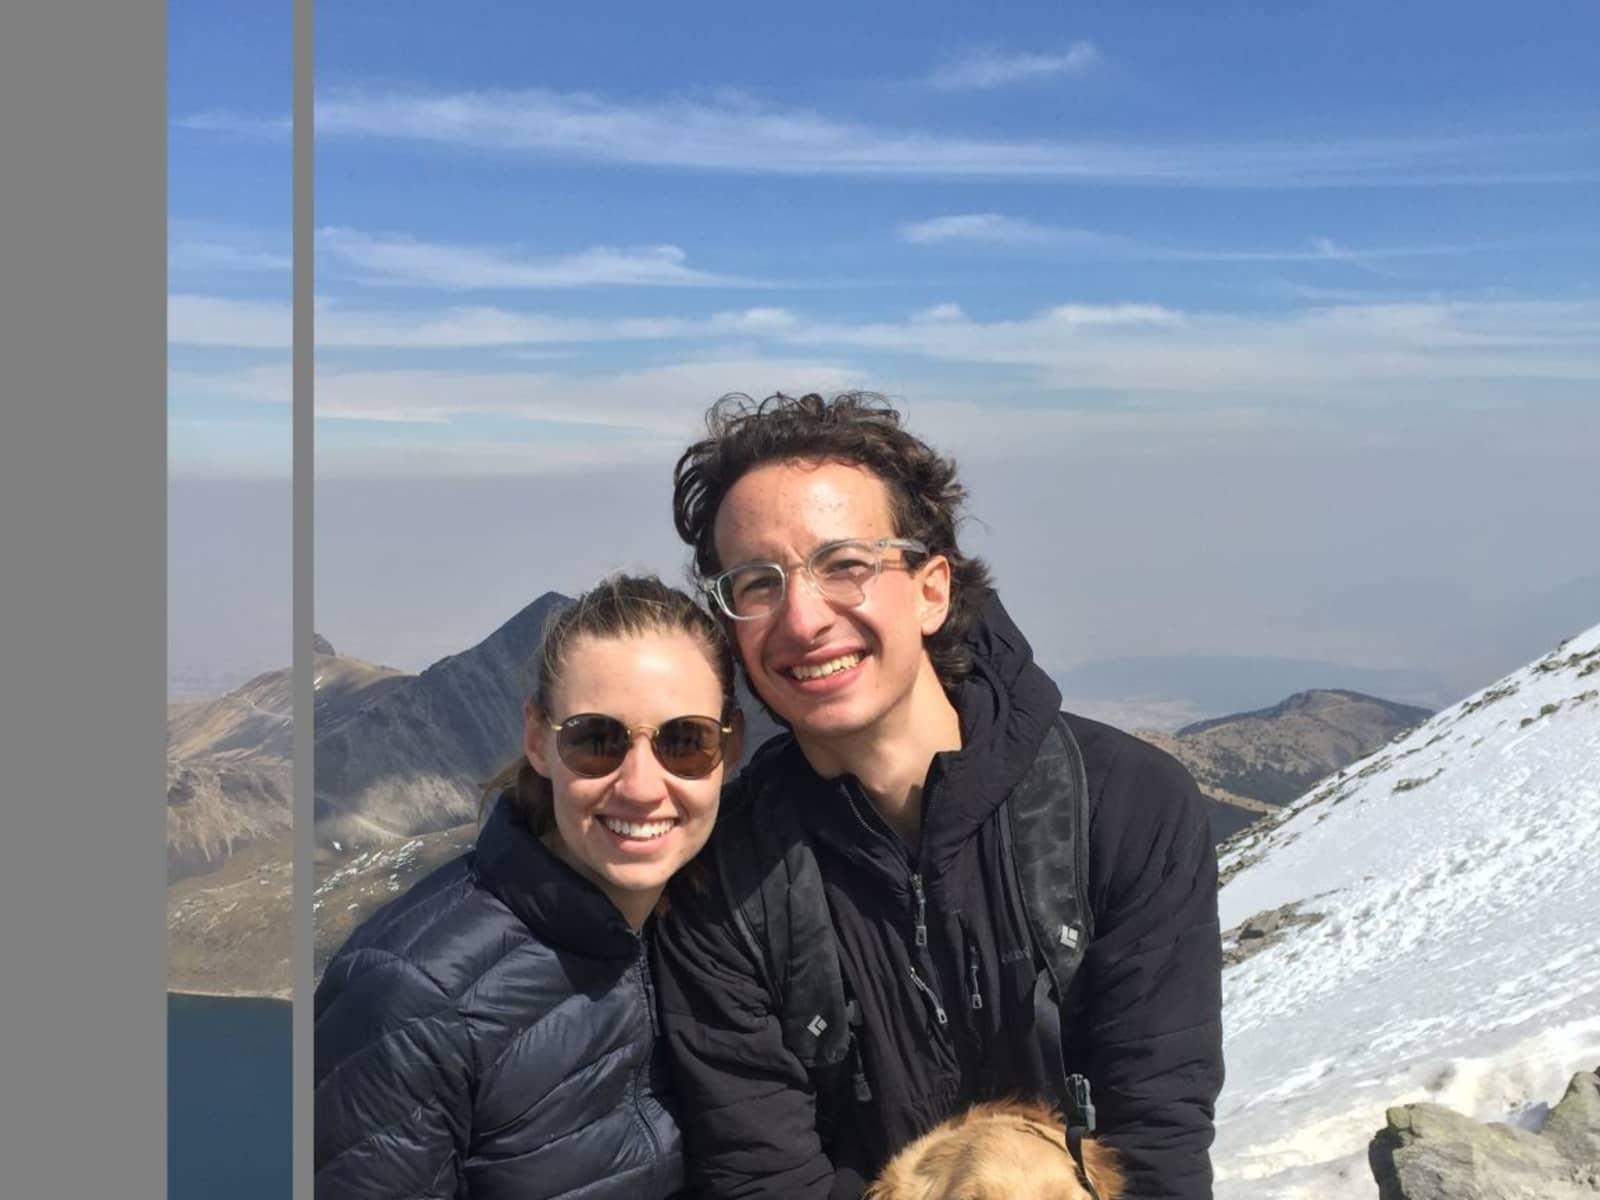 Michael & Dominique from Mexico City, Mexico